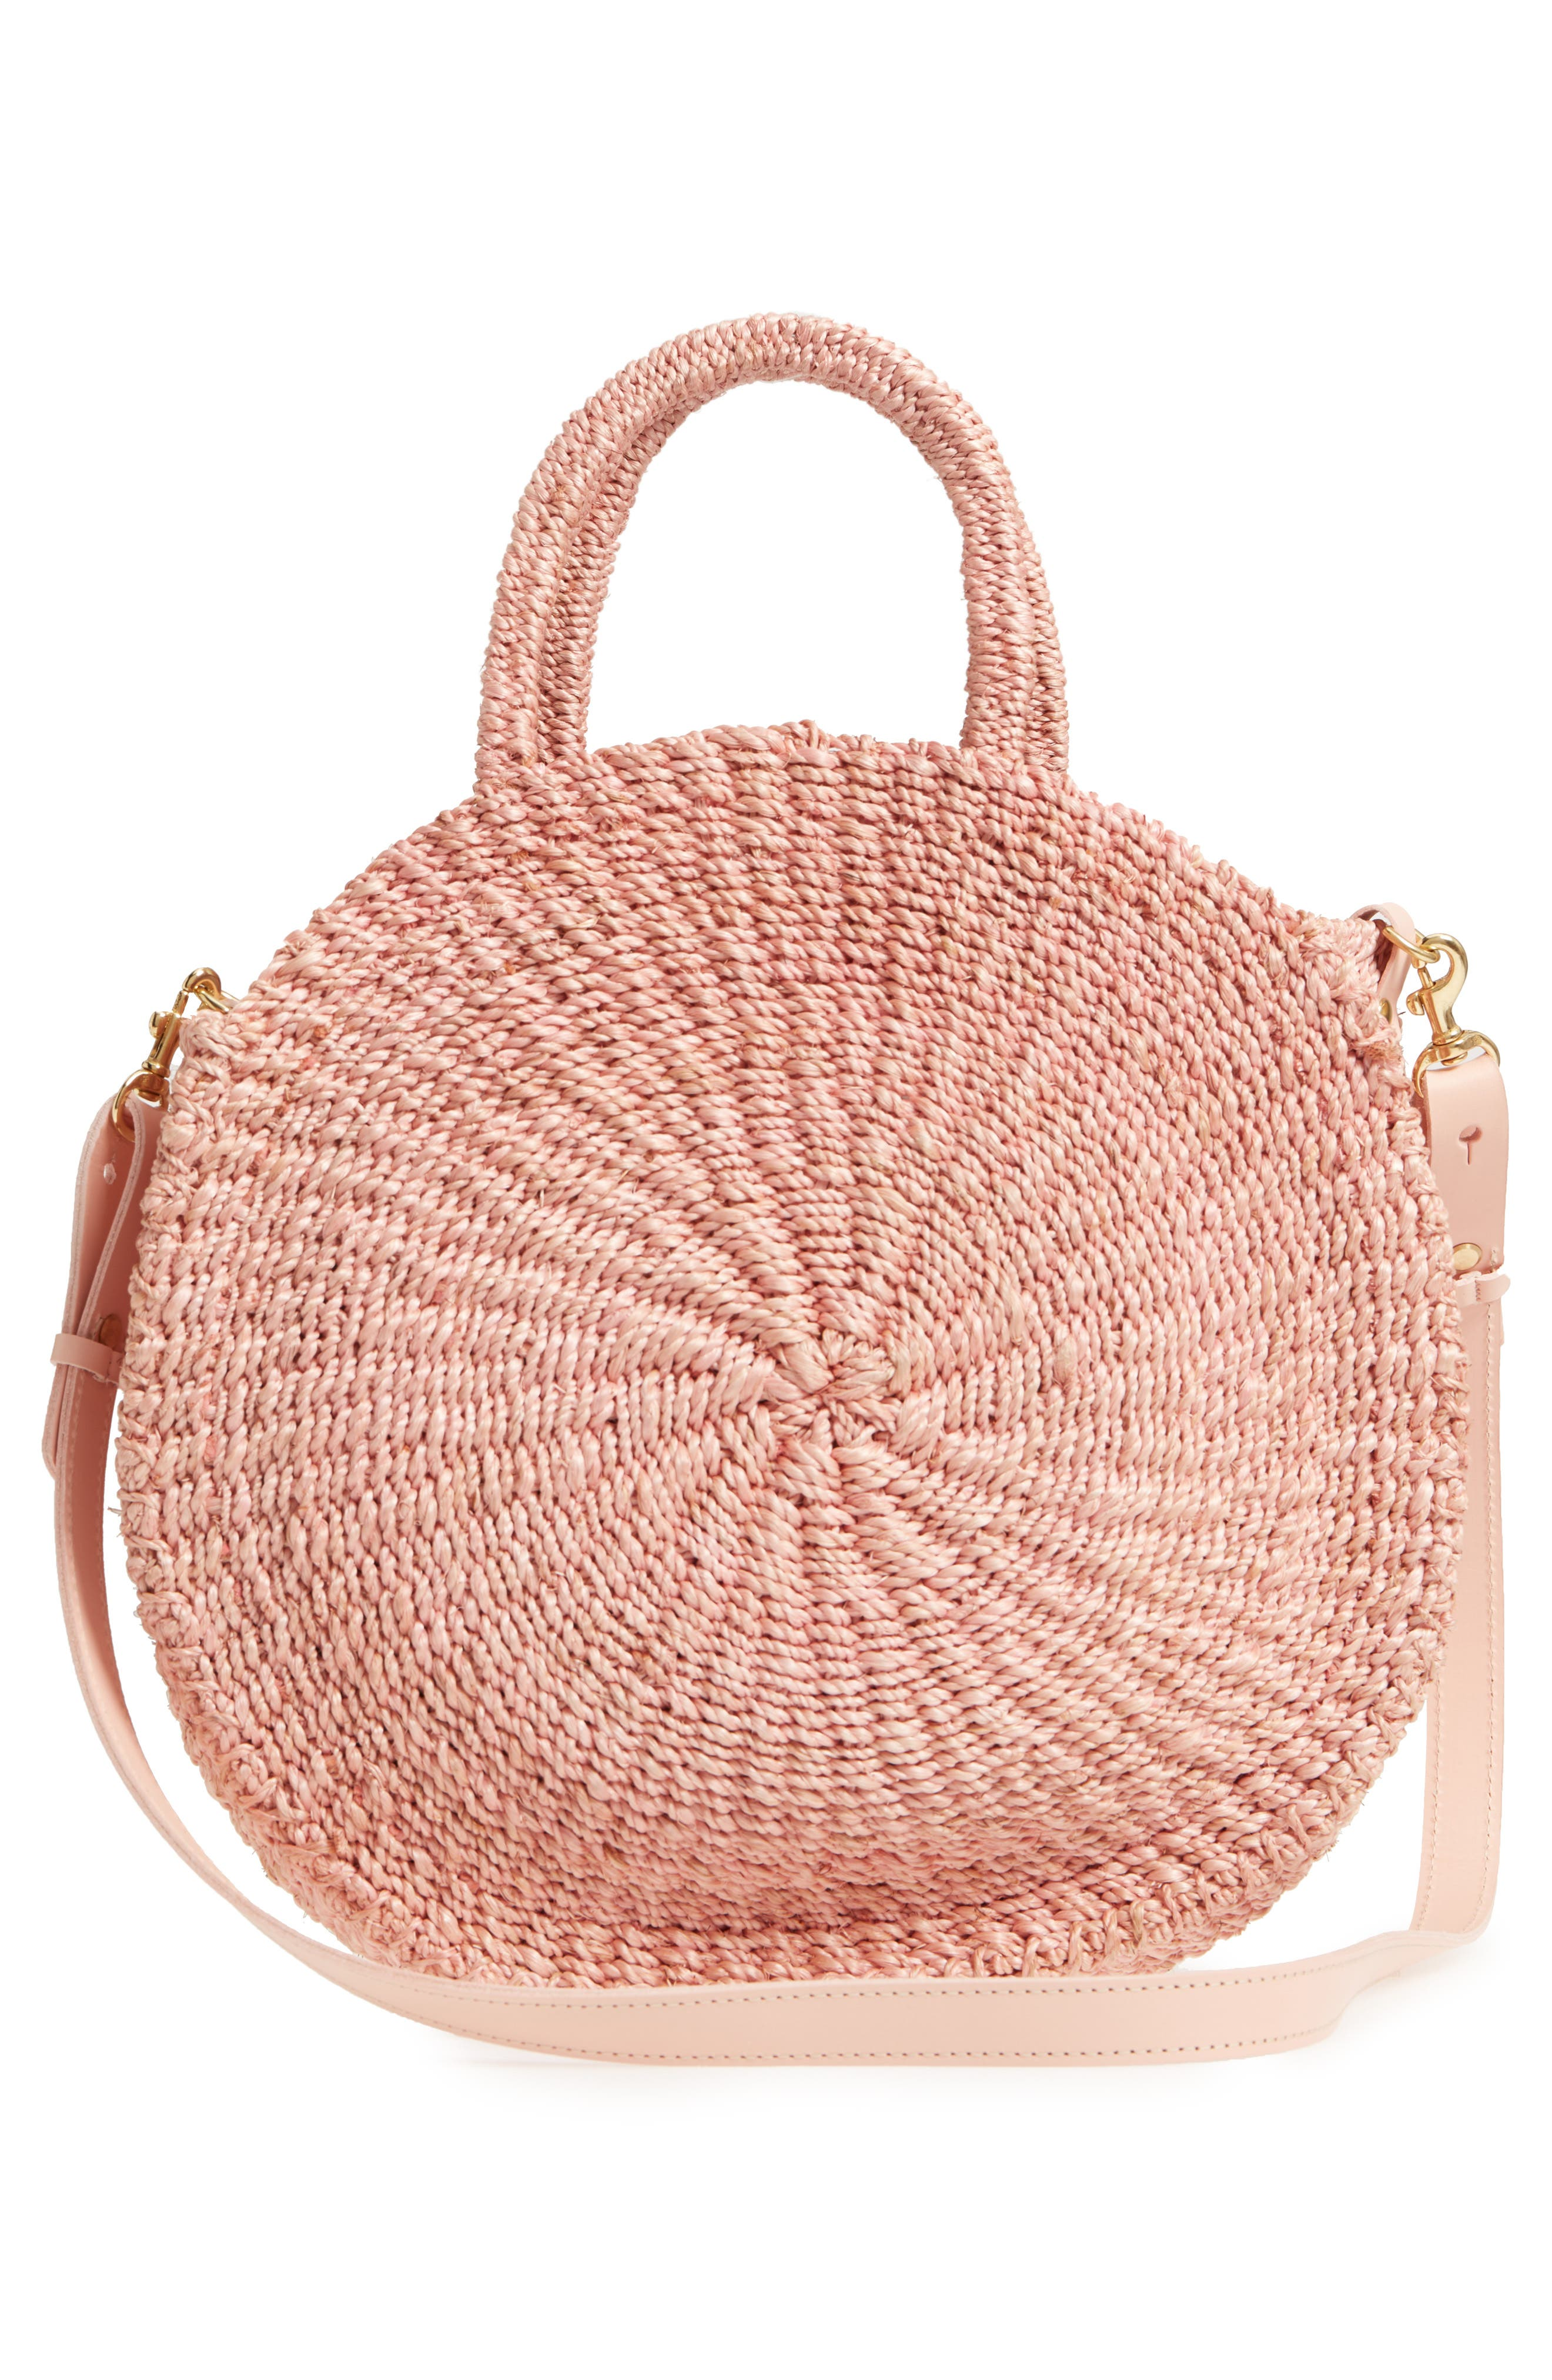 Alice Woven Sisal Straw Bag,                             Alternate thumbnail 3, color,                             Blush Woven